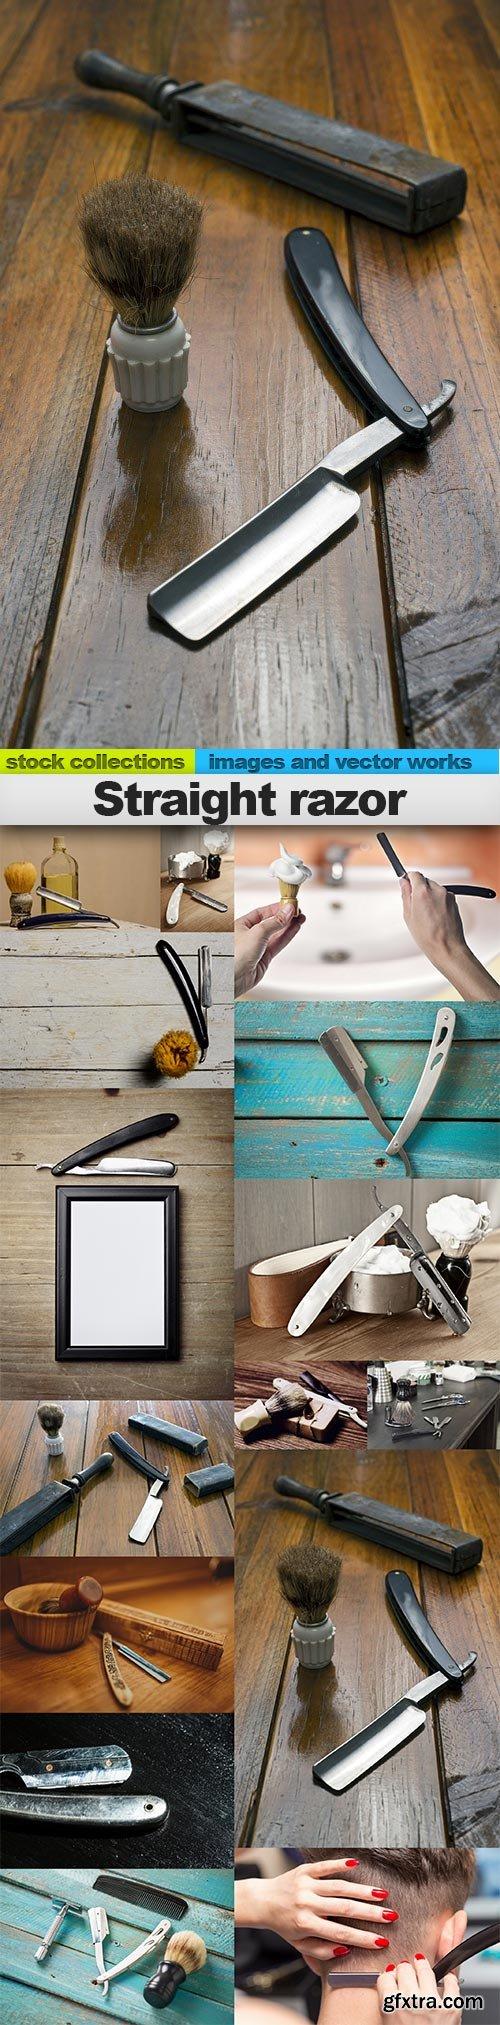 Straight razor, 15 x UHQ JPEG